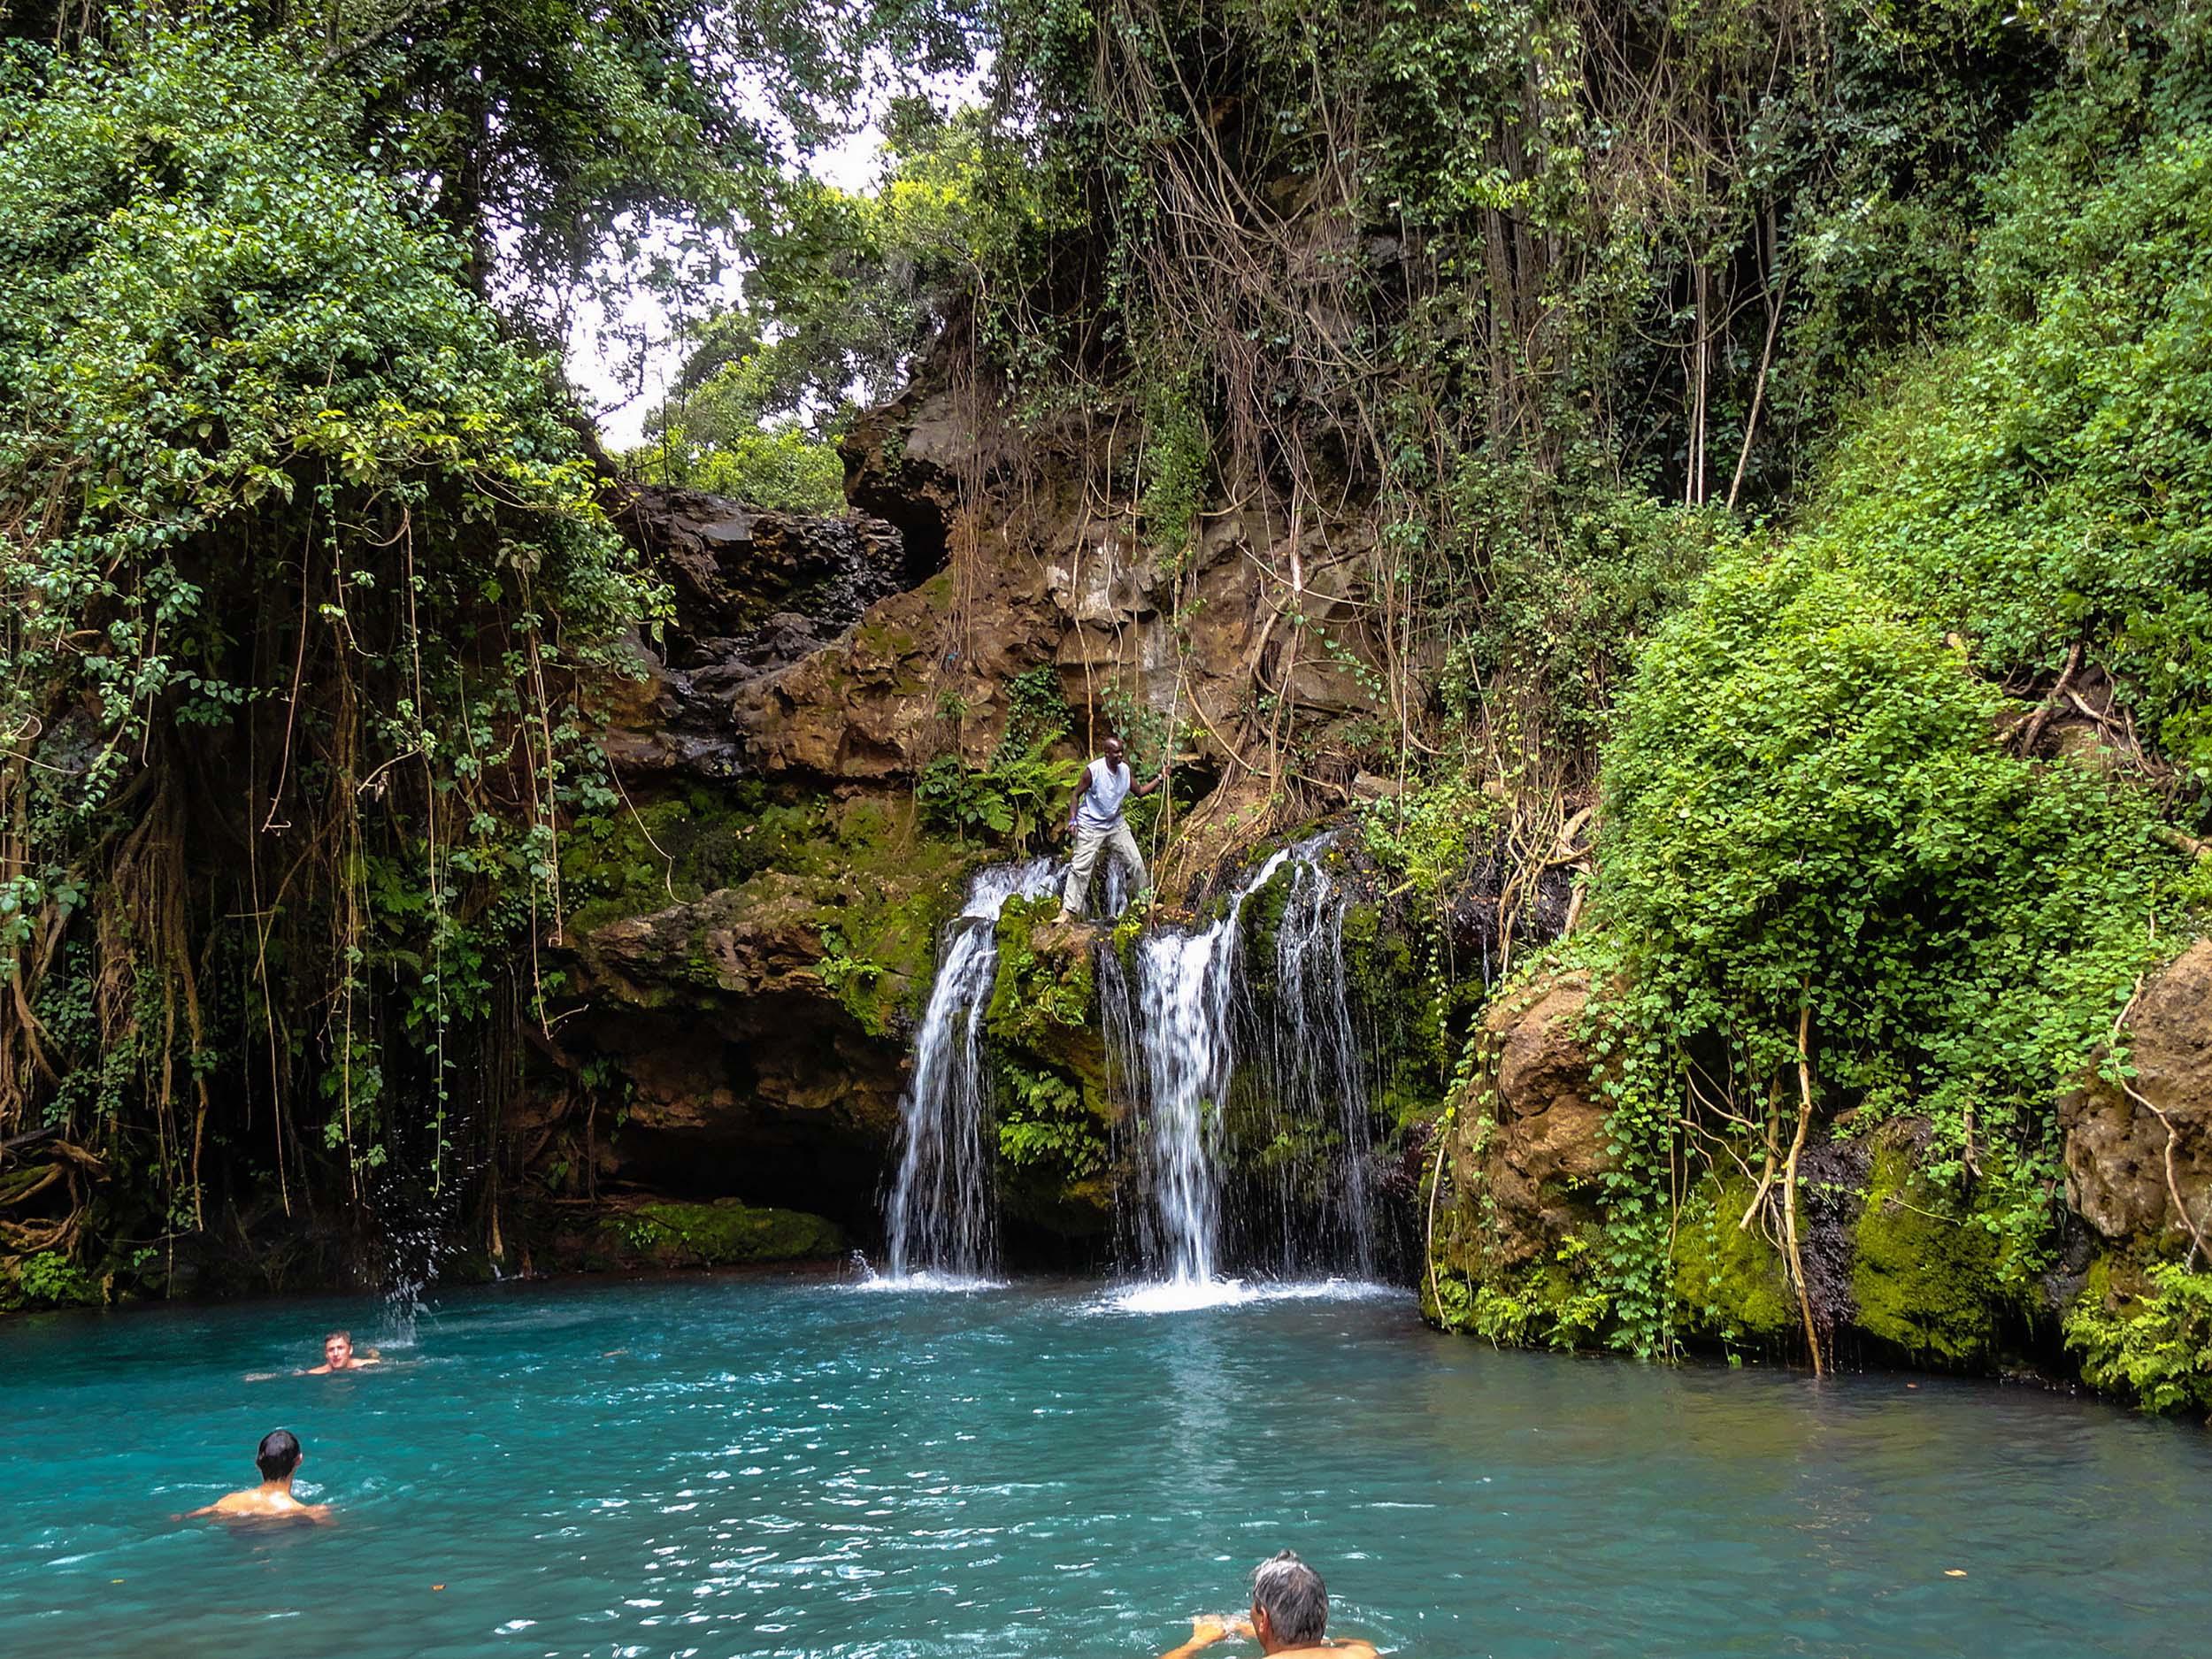 Kenya Lewa House Ngare Ndare waterfalls